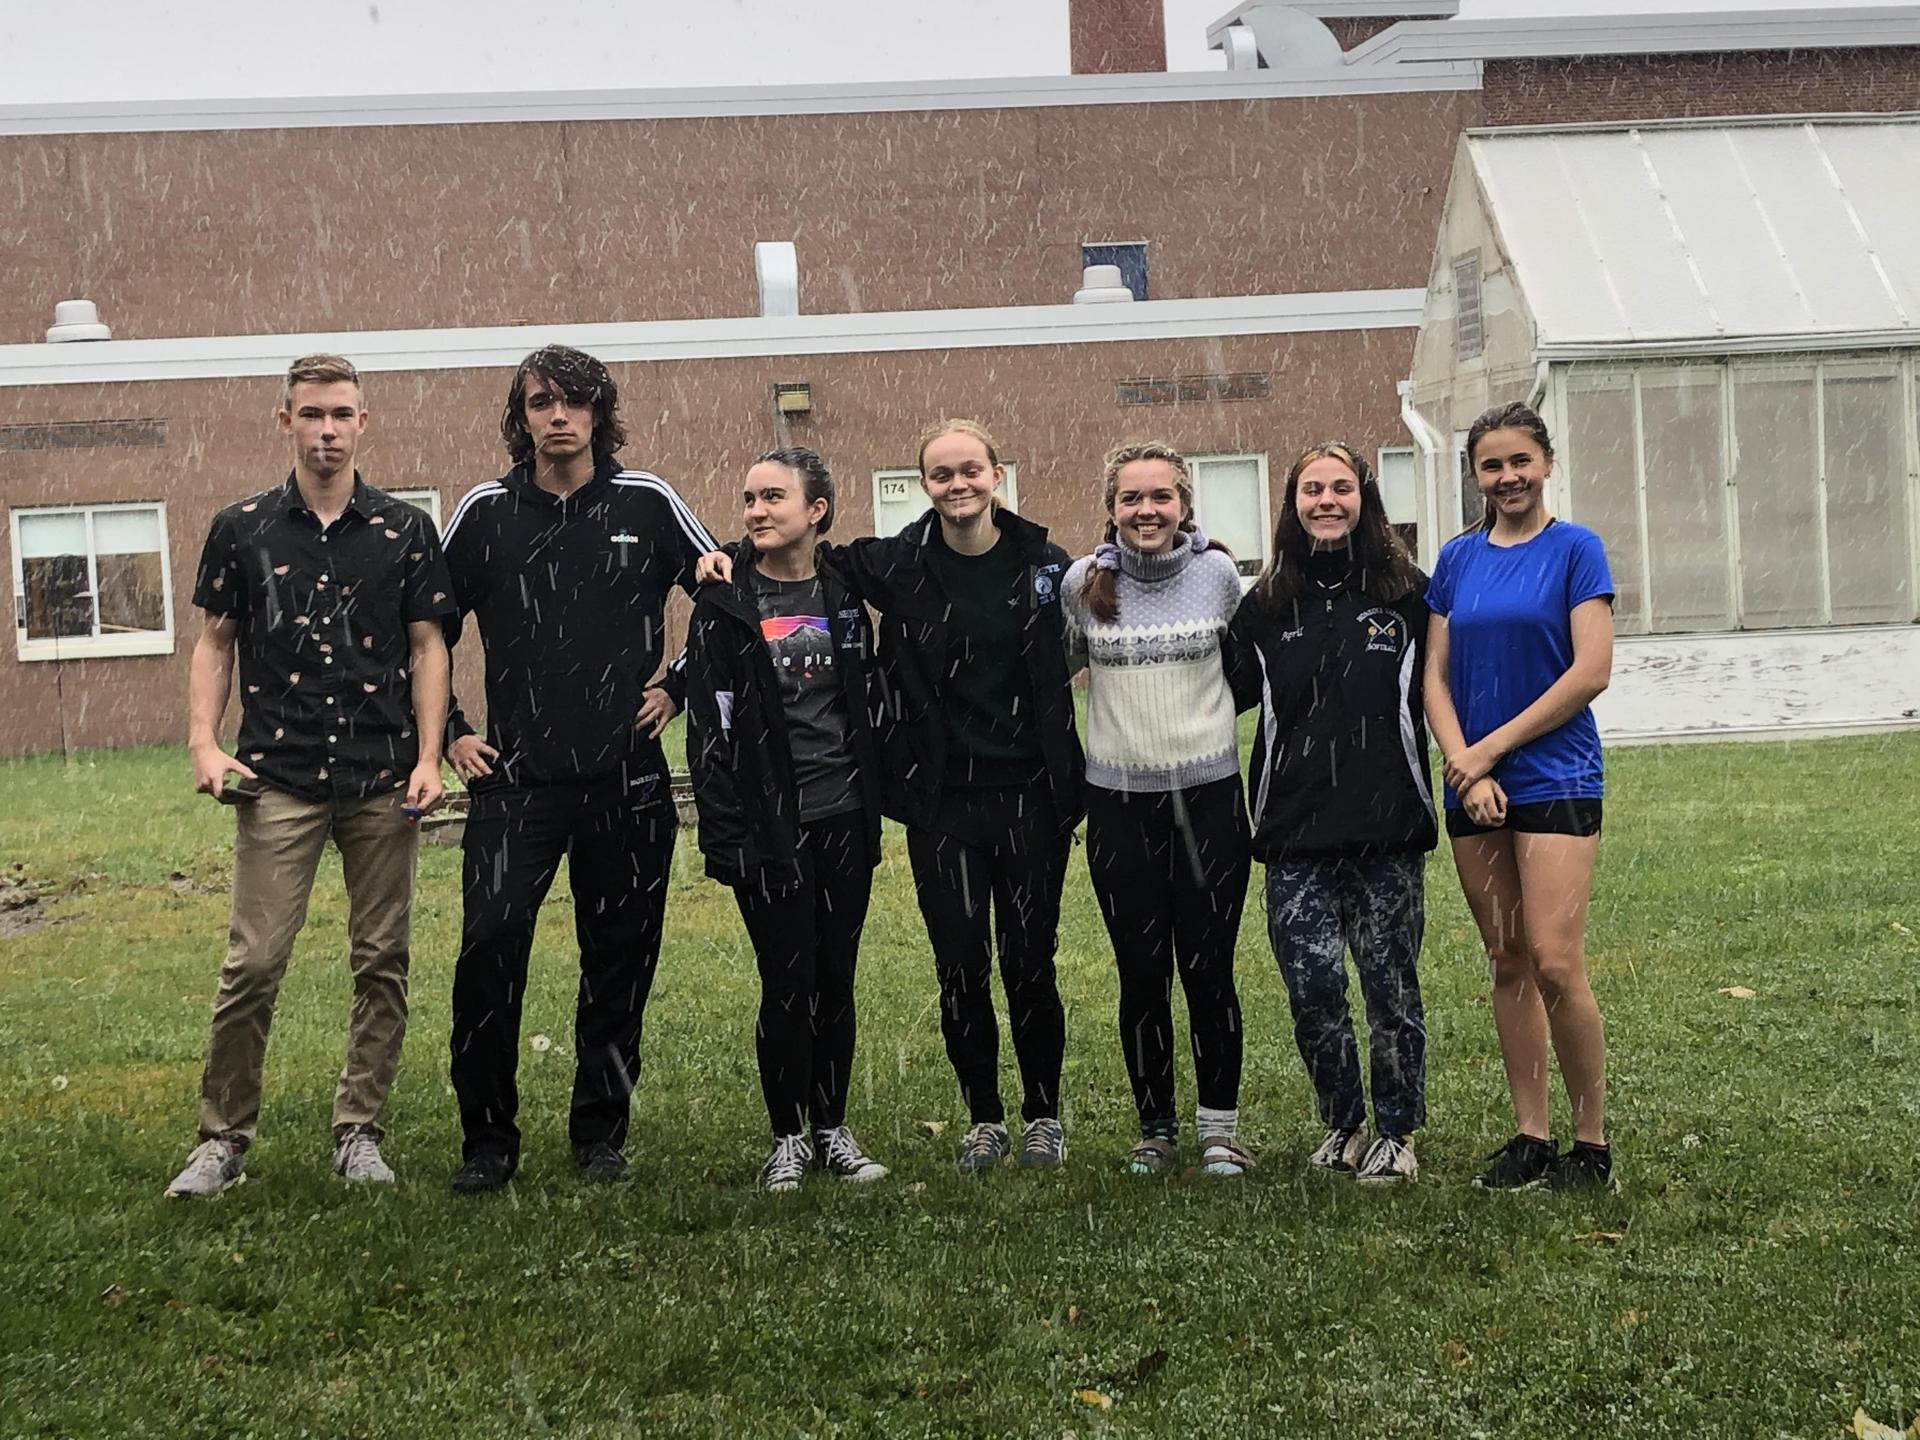 Precalc students enjoying the first snowfall of the season!